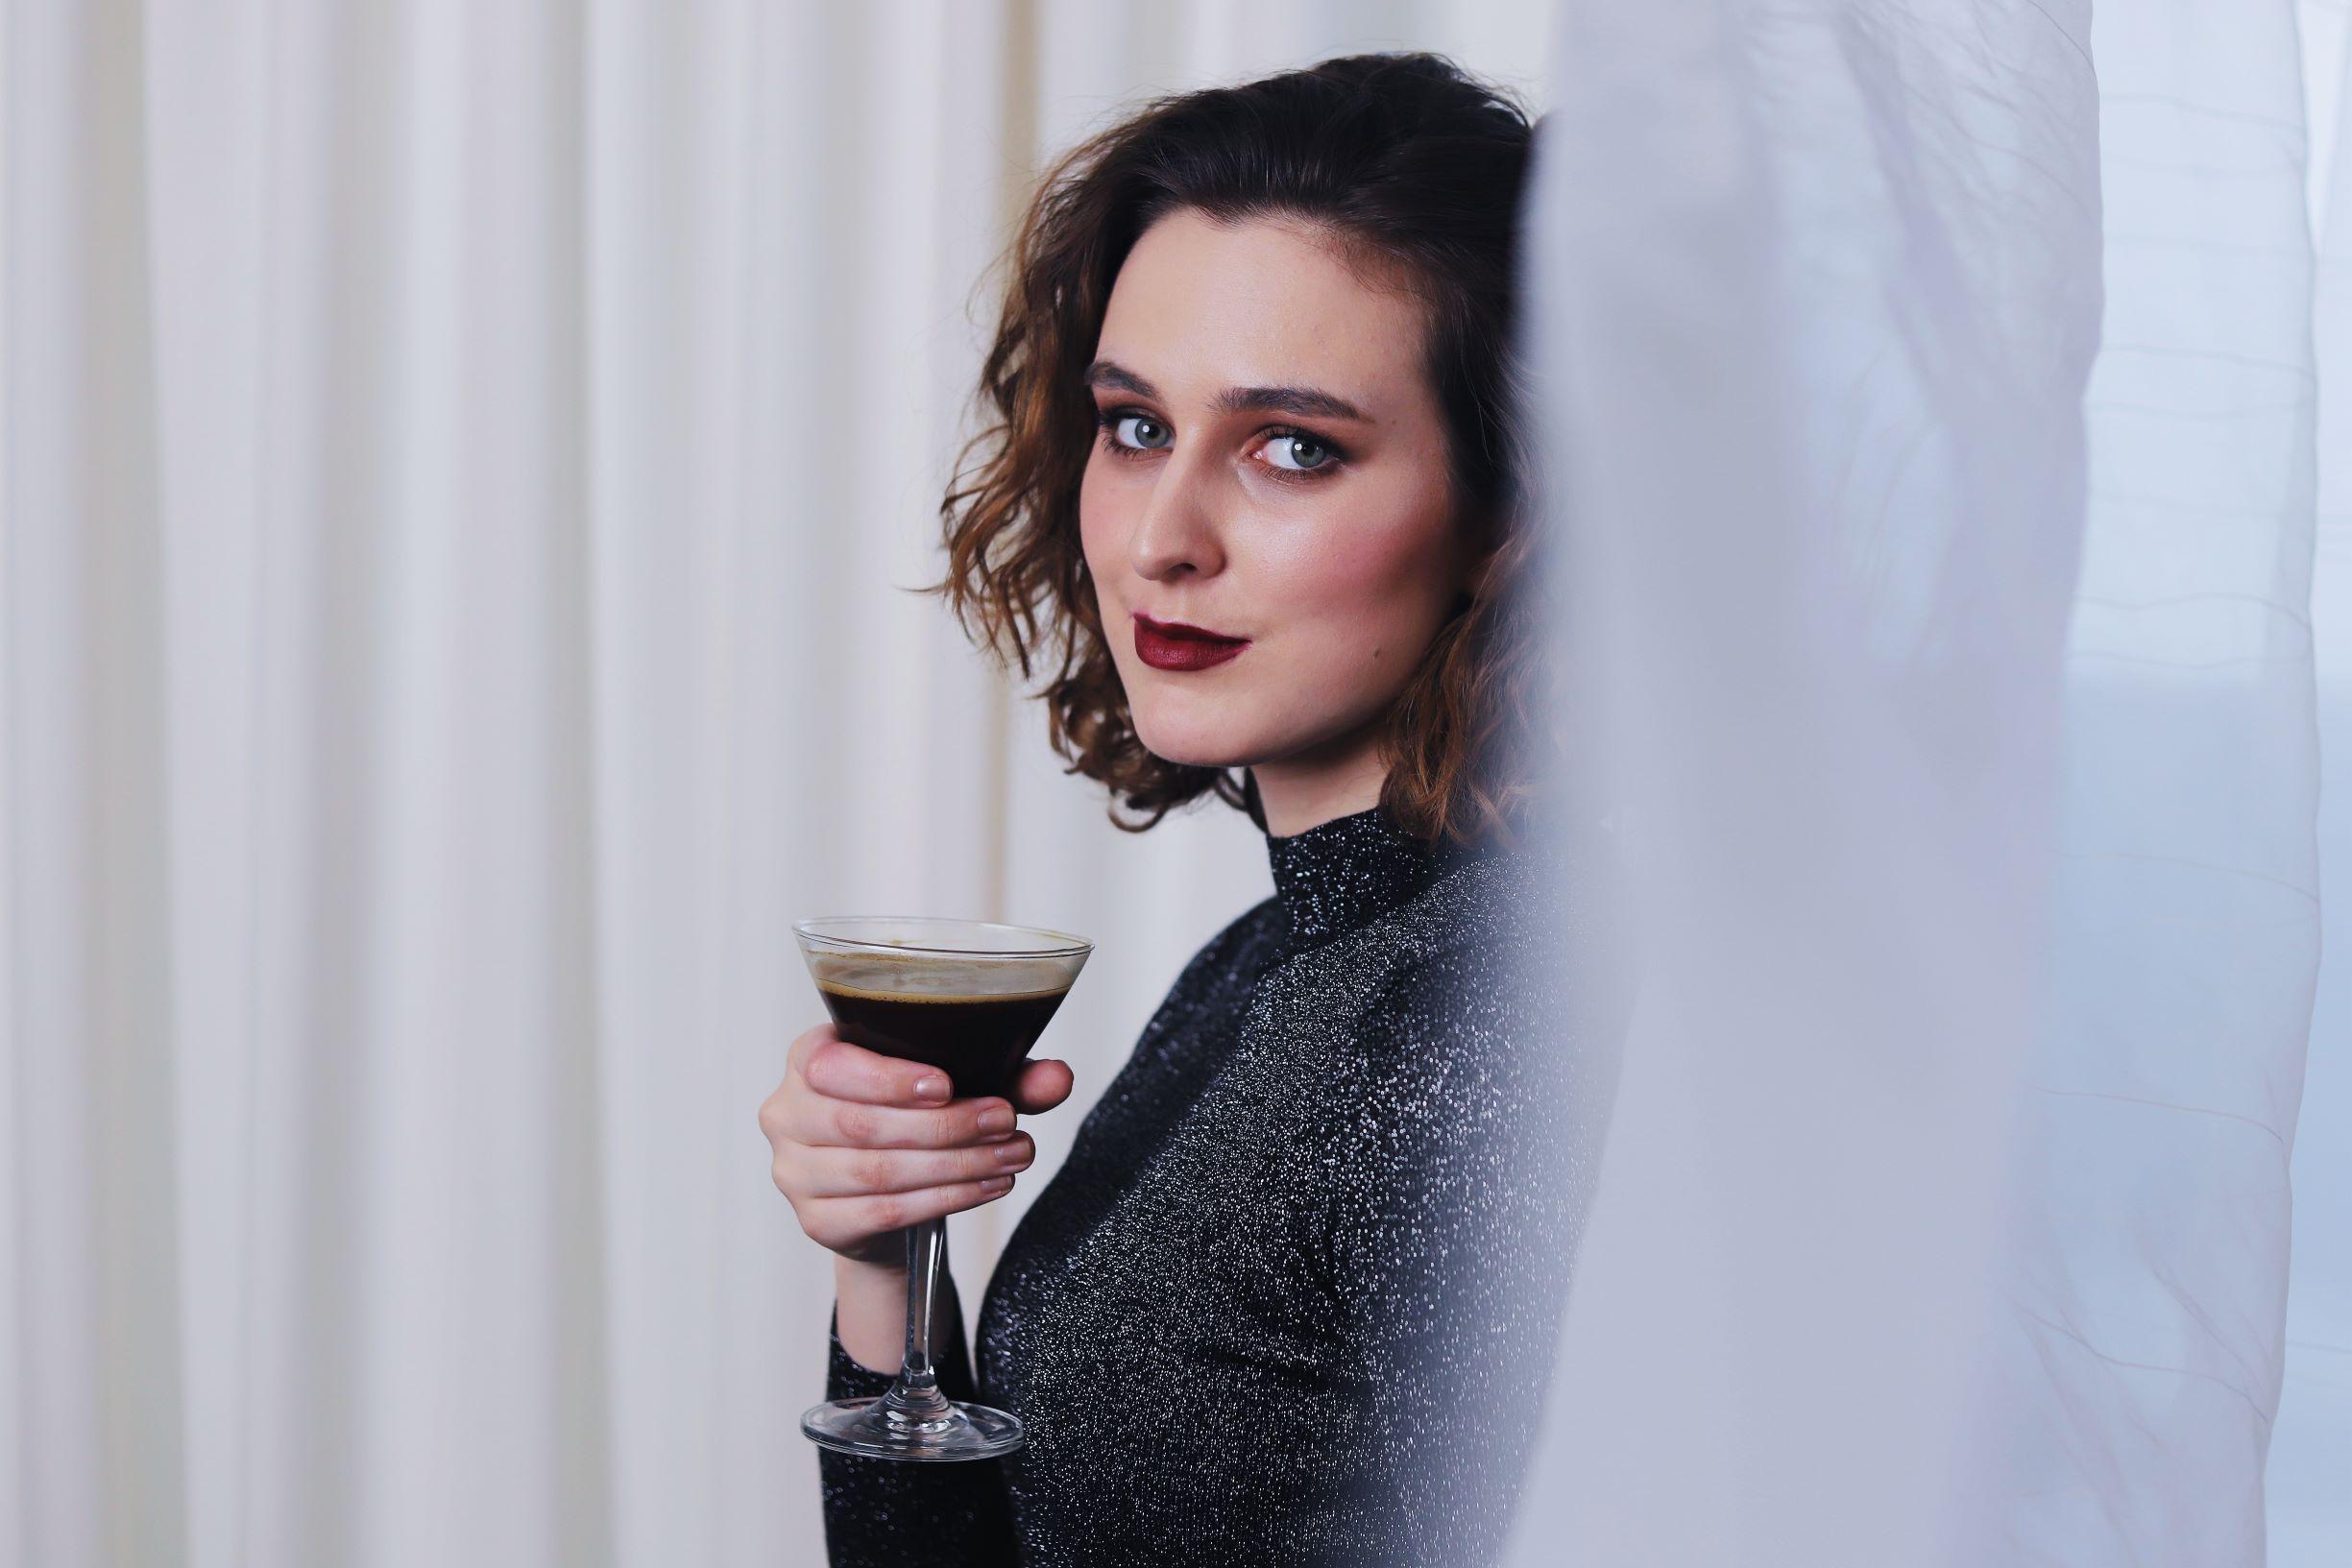 LeClair Organics Coffee Saskatoon, Coffee Roaster Saskatoon commercial photography with Jenna Rozlin 22